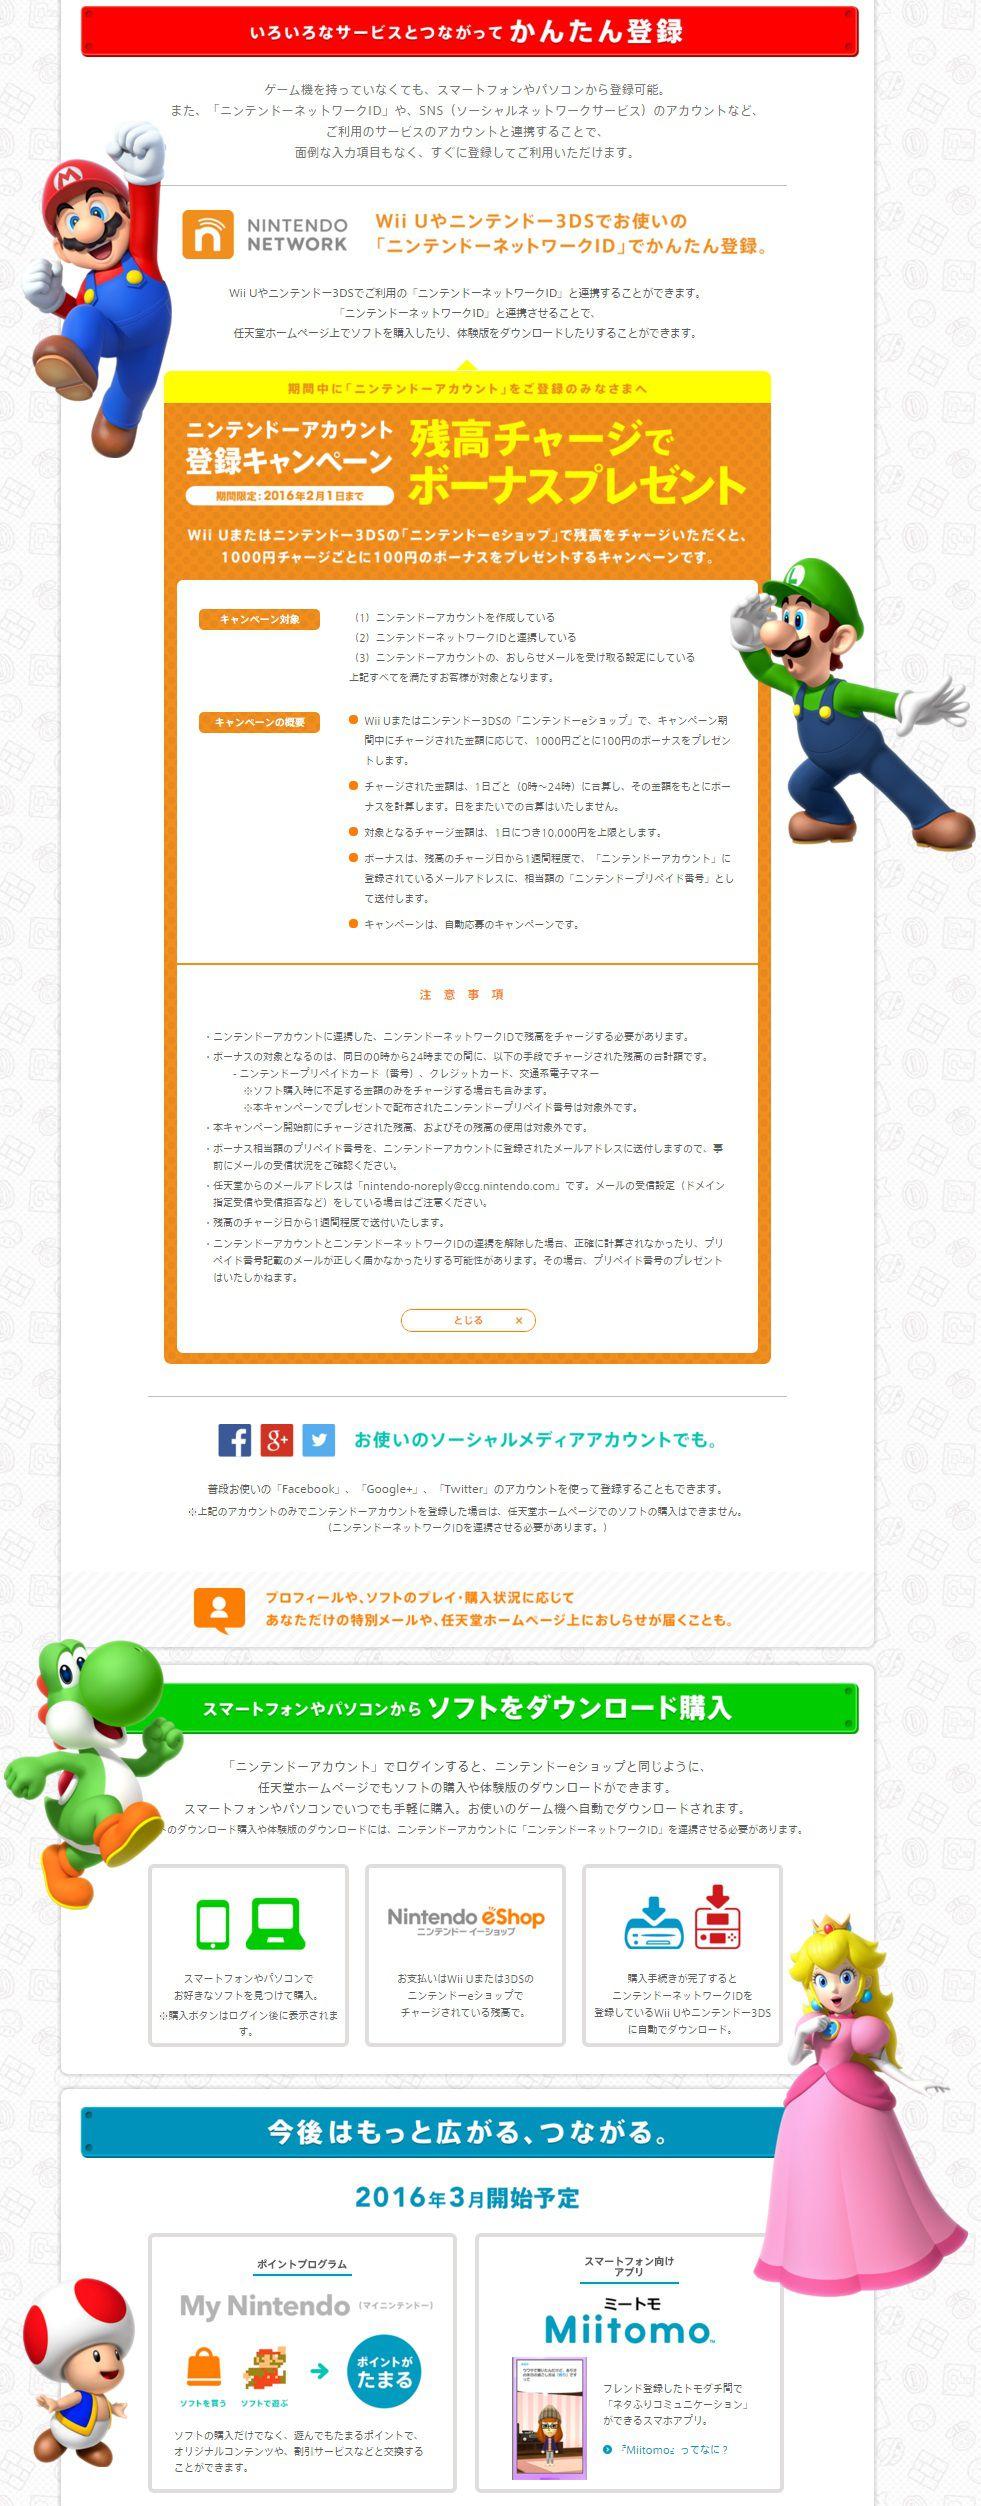 image_3522.jpg